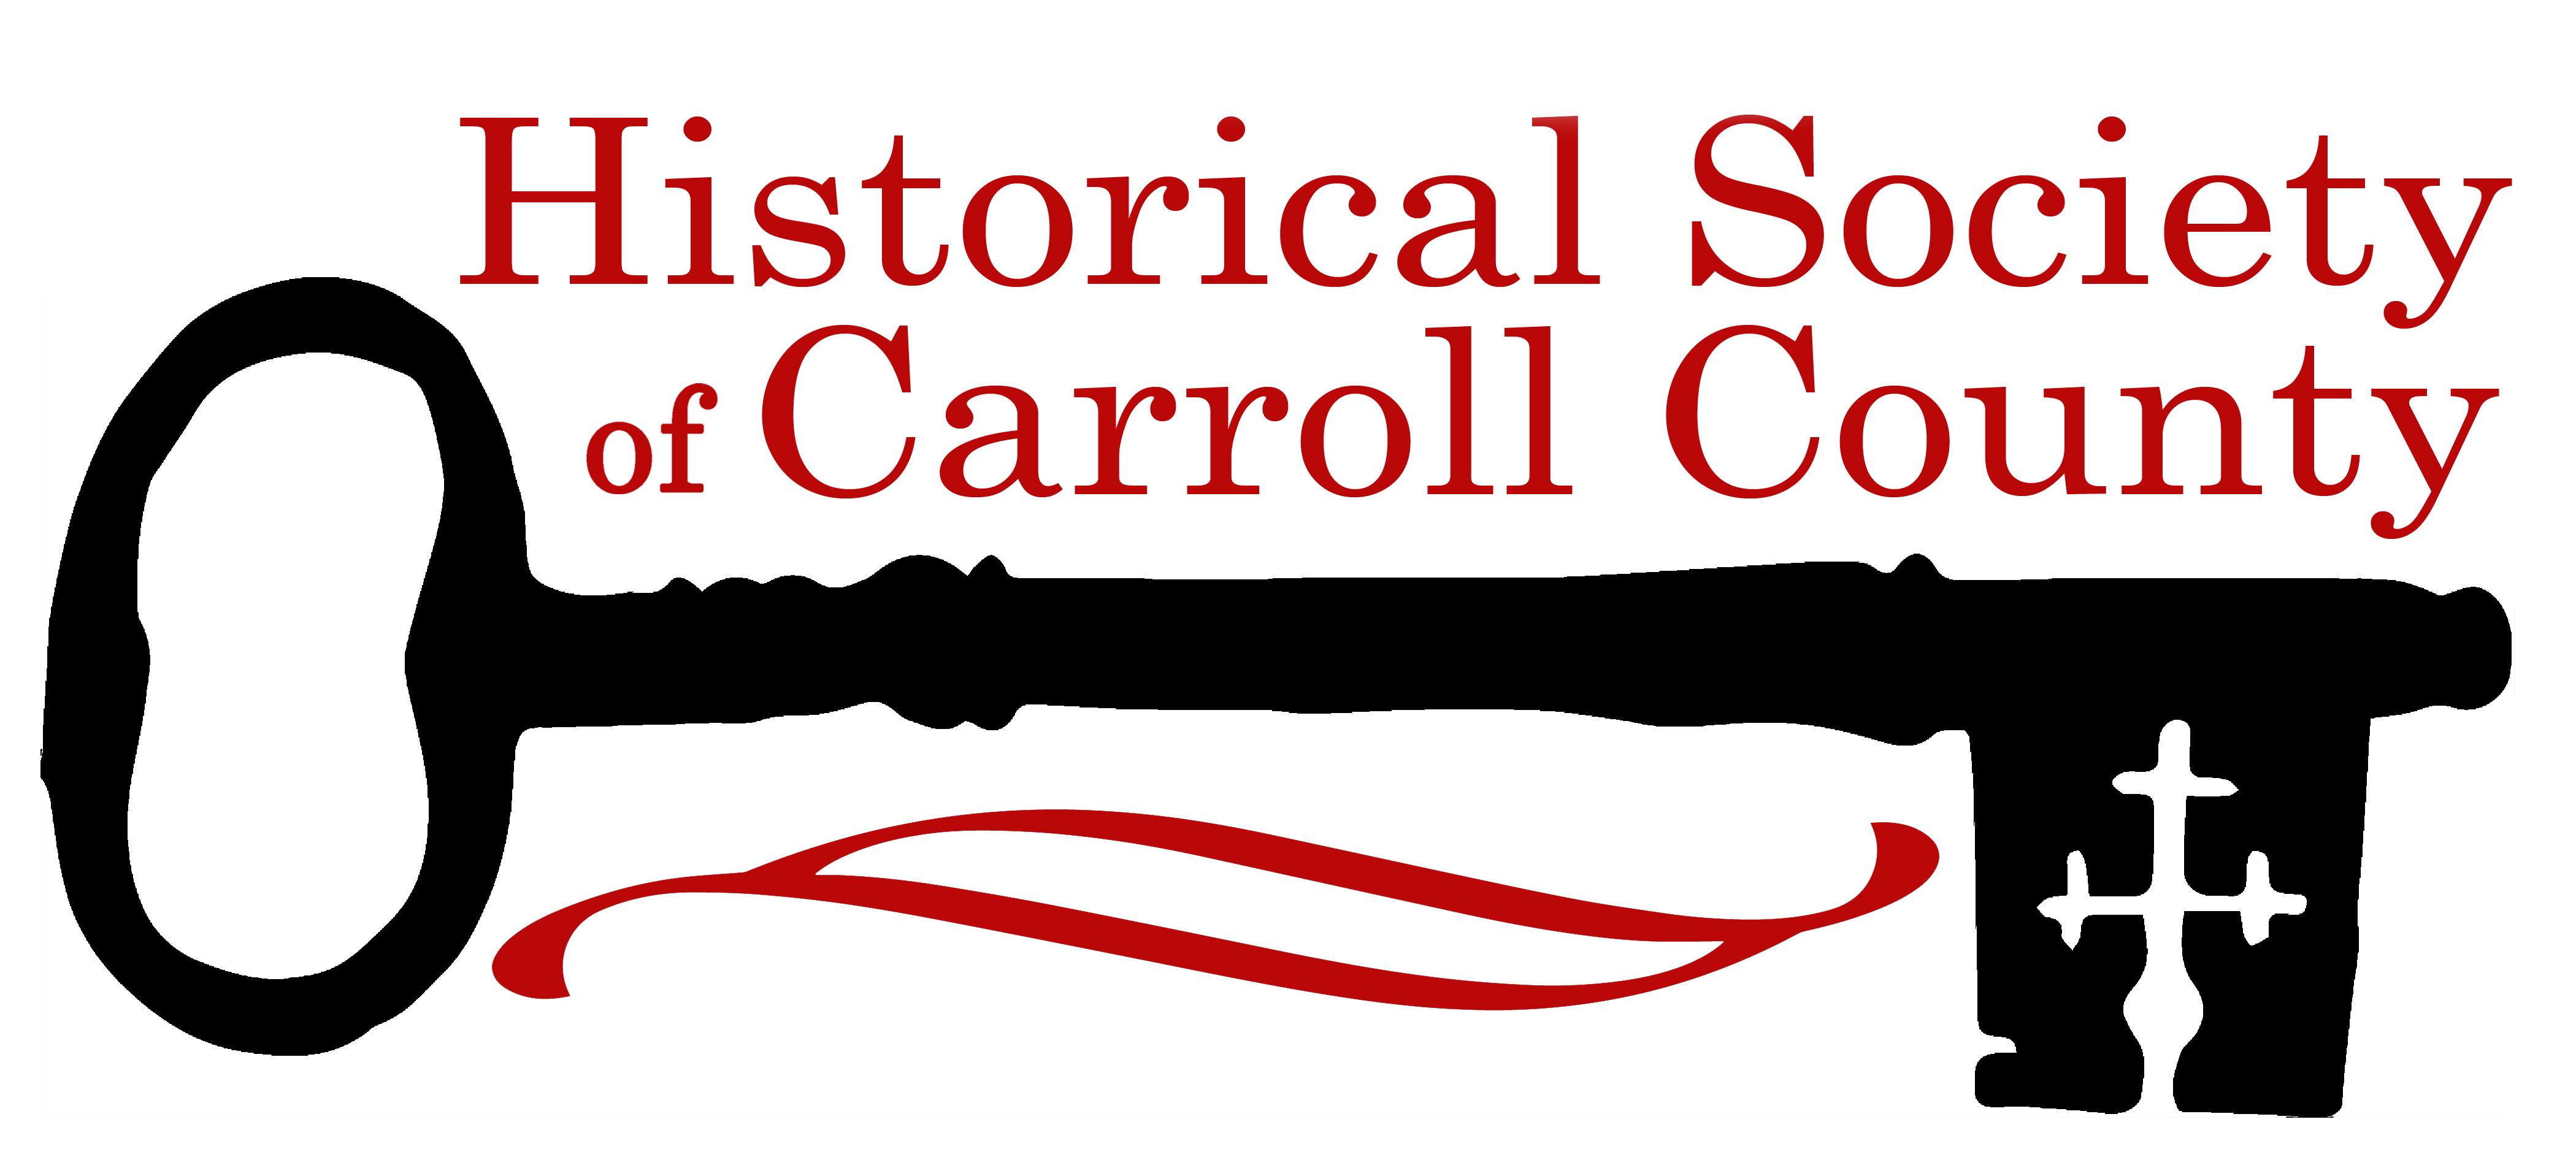 Historical Society of Carroll County